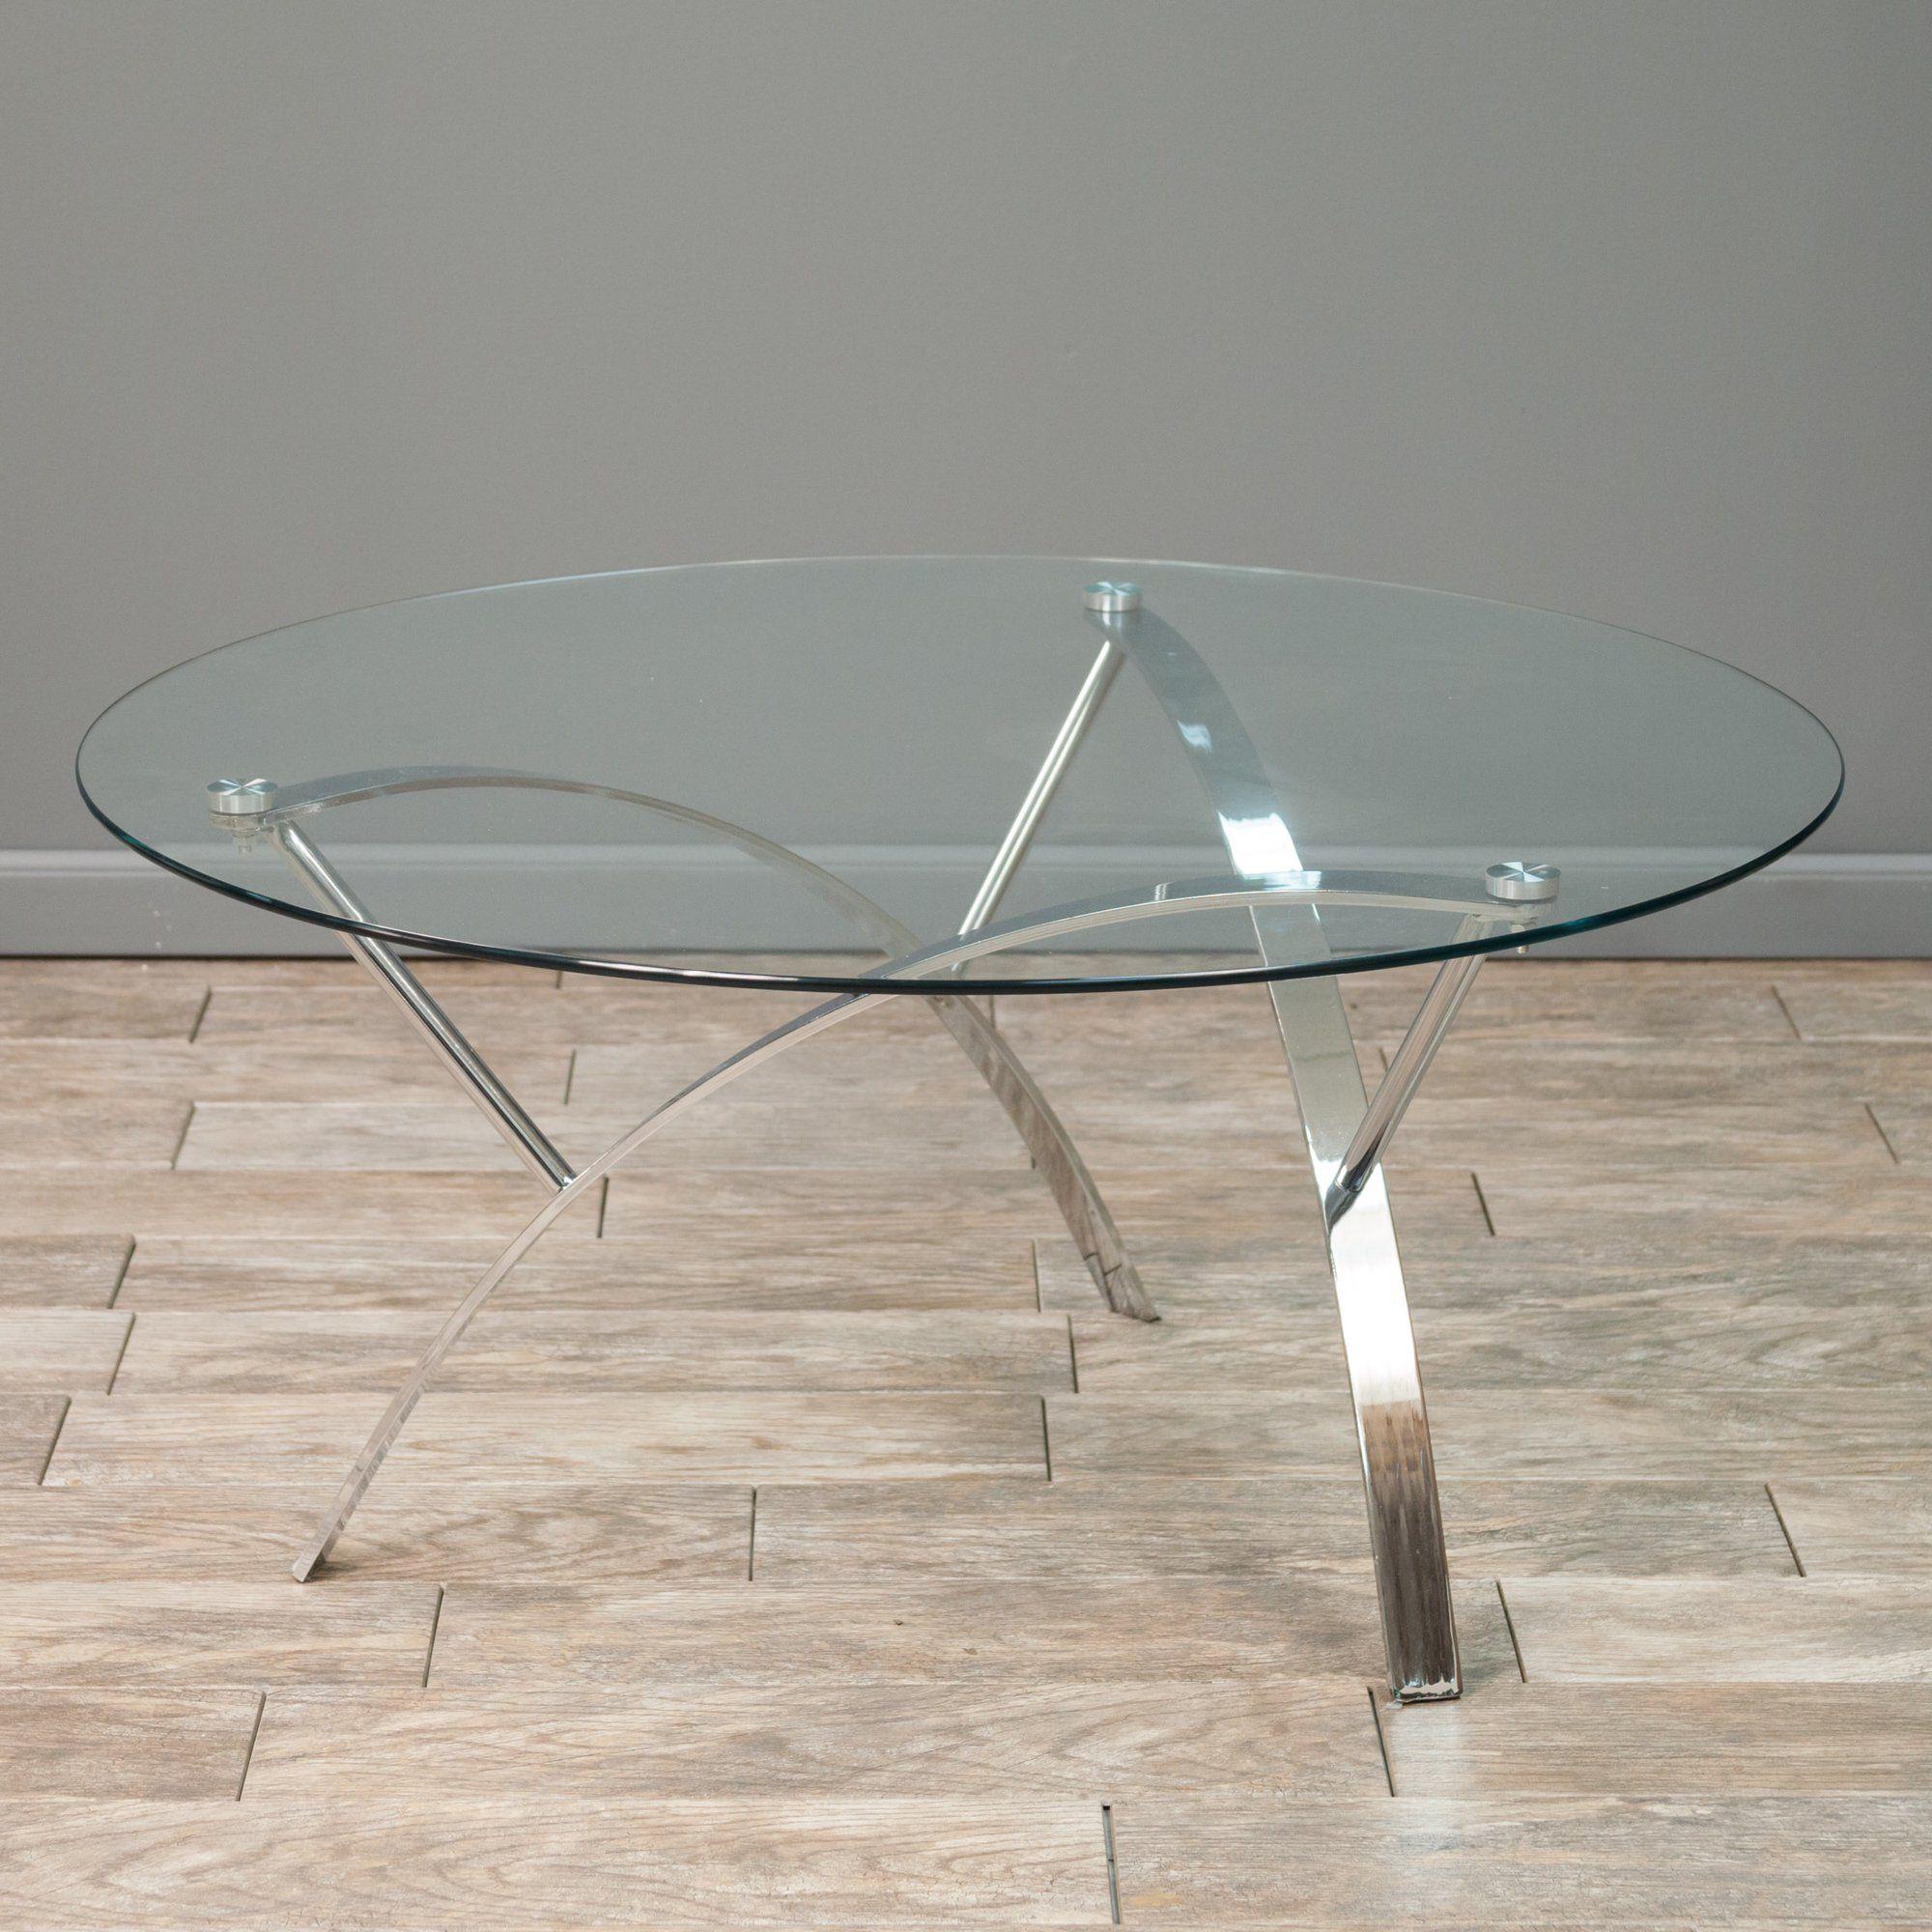 Skokie Coffee Table Walmart Com Coffee Table Round Glass Coffee Table Glass Top Coffee Table [ 2000 x 2000 Pixel ]